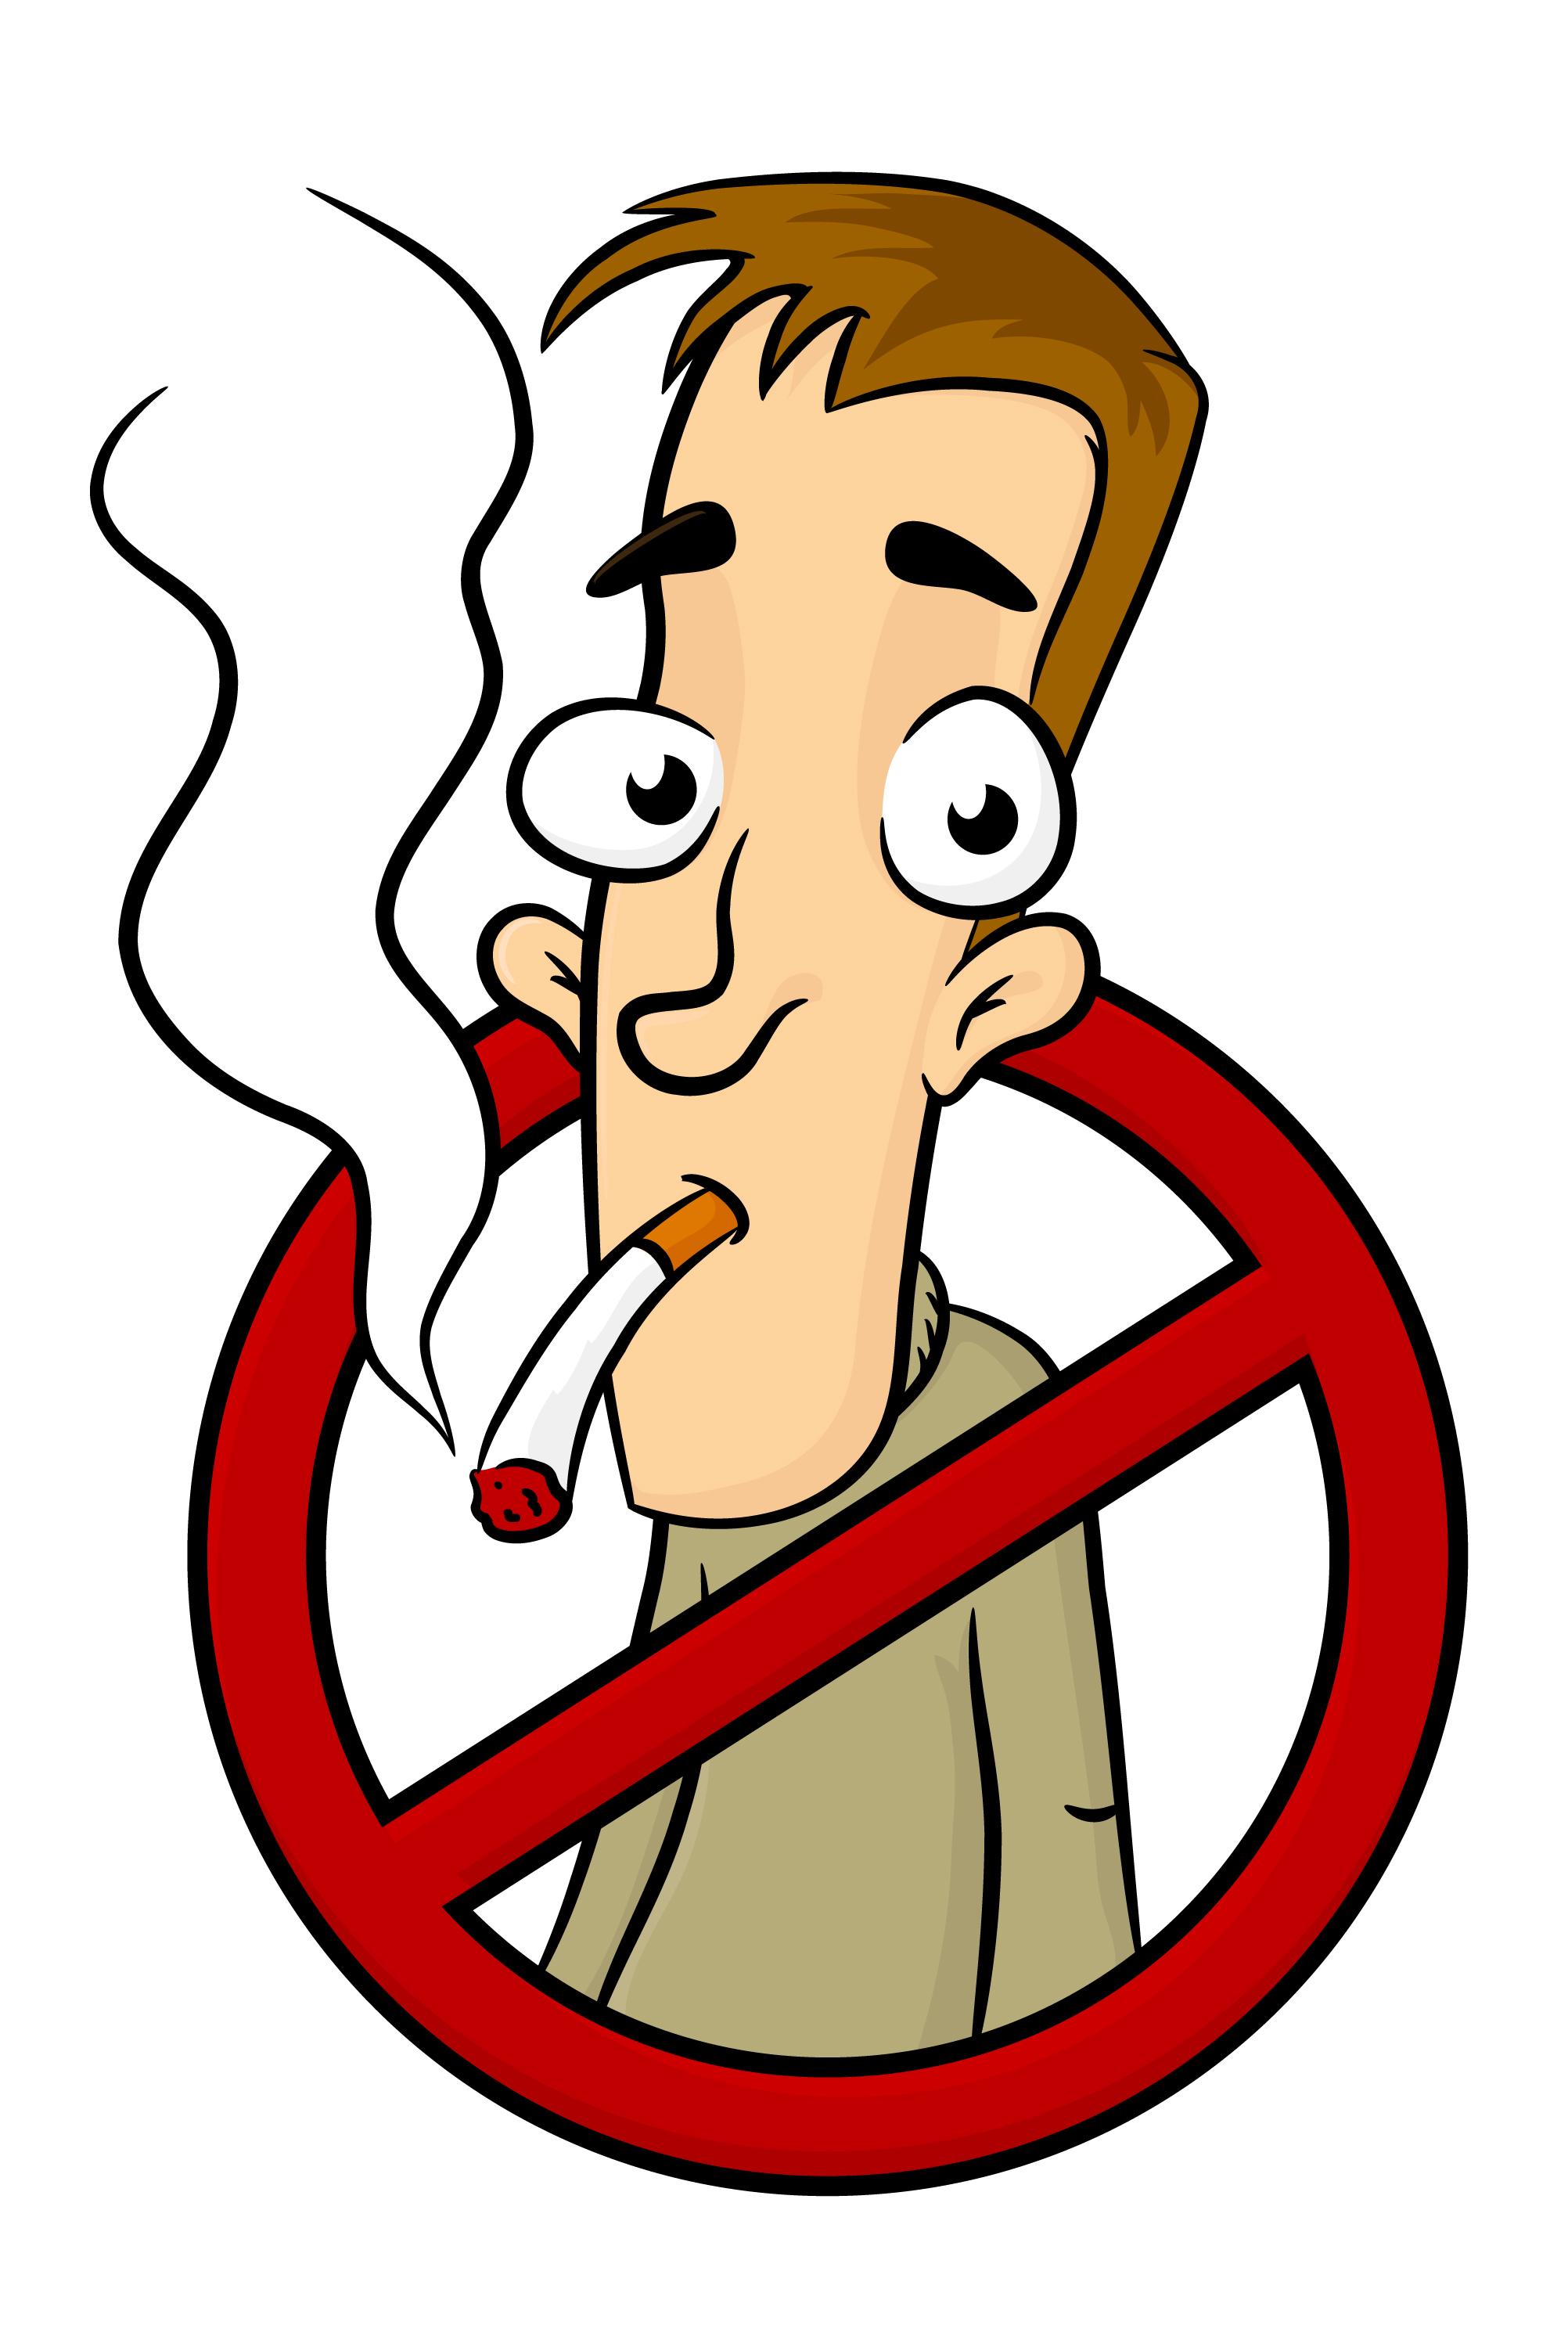 2004x2985 No Smoking Clipart